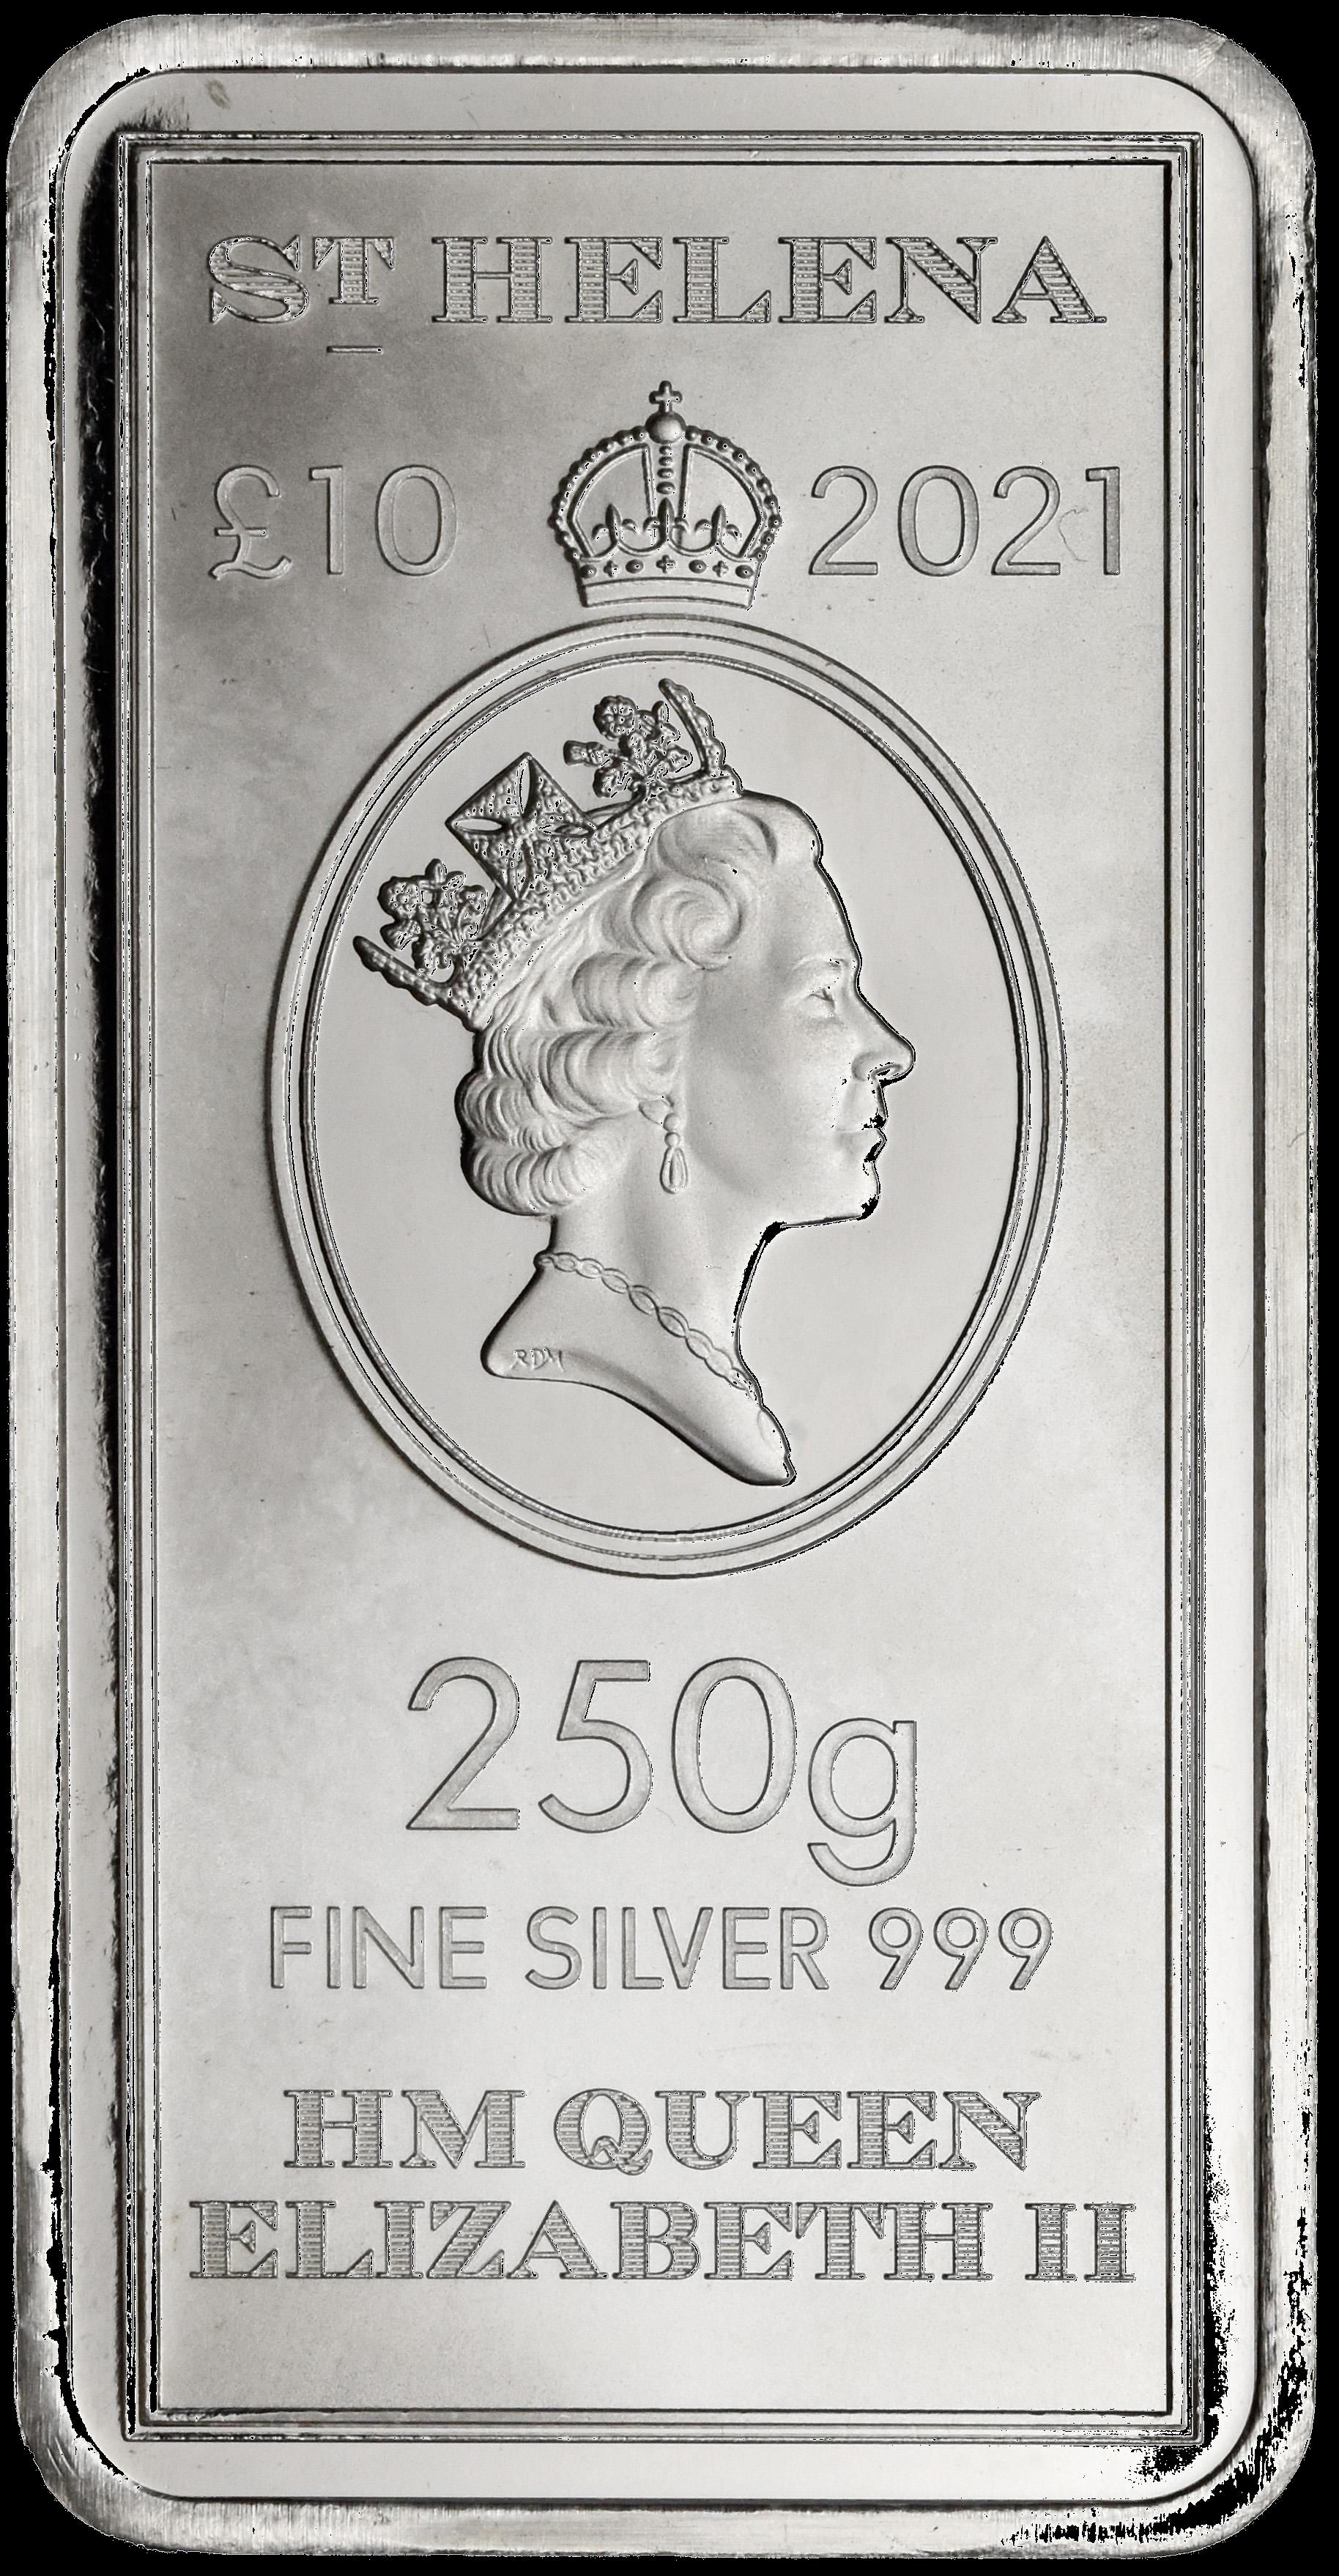 Saint Helena Legal Tender 250 Gram Coin Bar (Mid June Delivery)